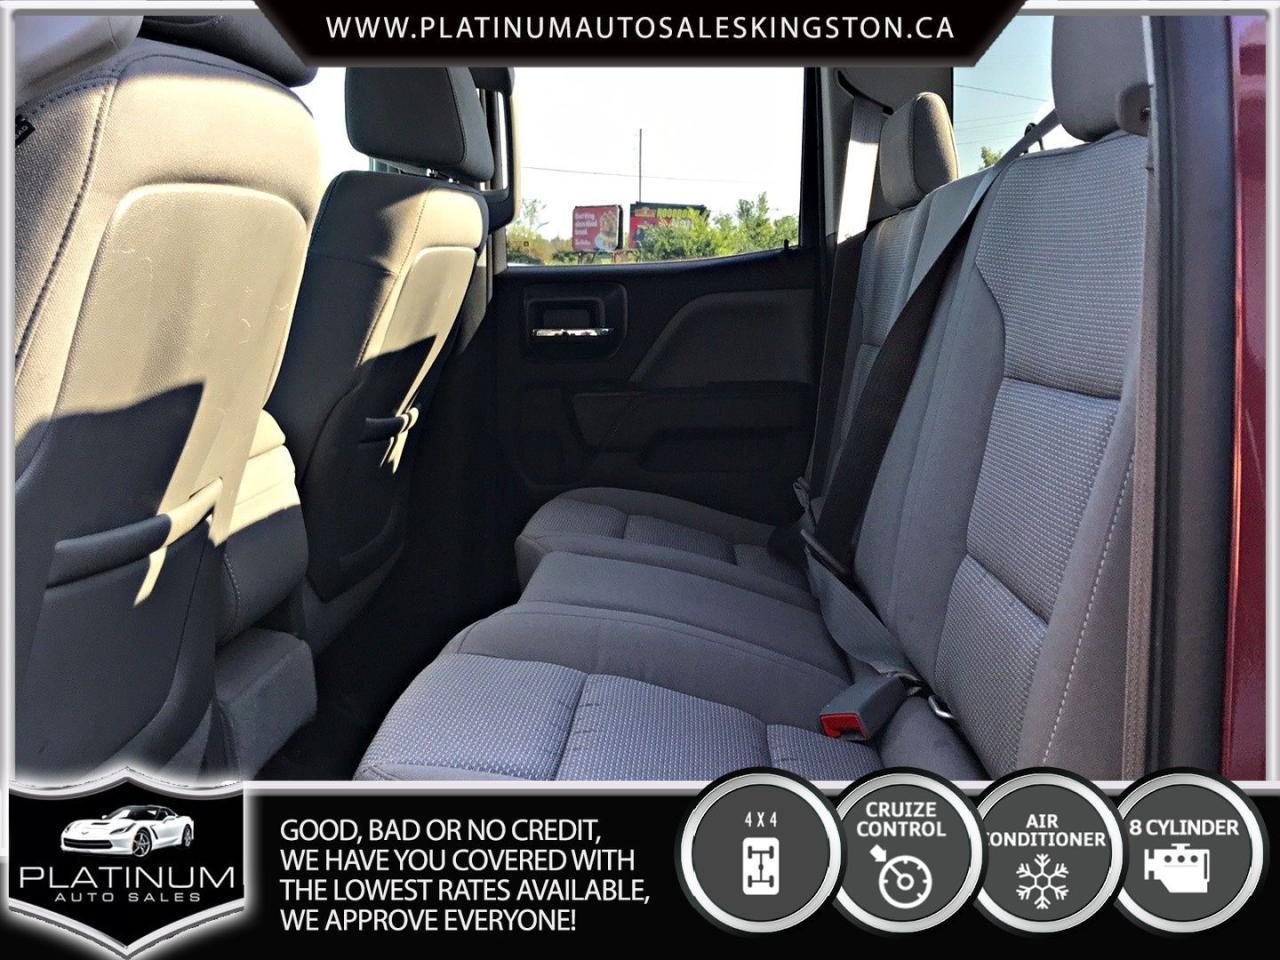 Magnificent 2014 Gmc Sierra 1500 In Kingston Platinum Auto Sales Customarchery Wood Chair Design Ideas Customarcherynet